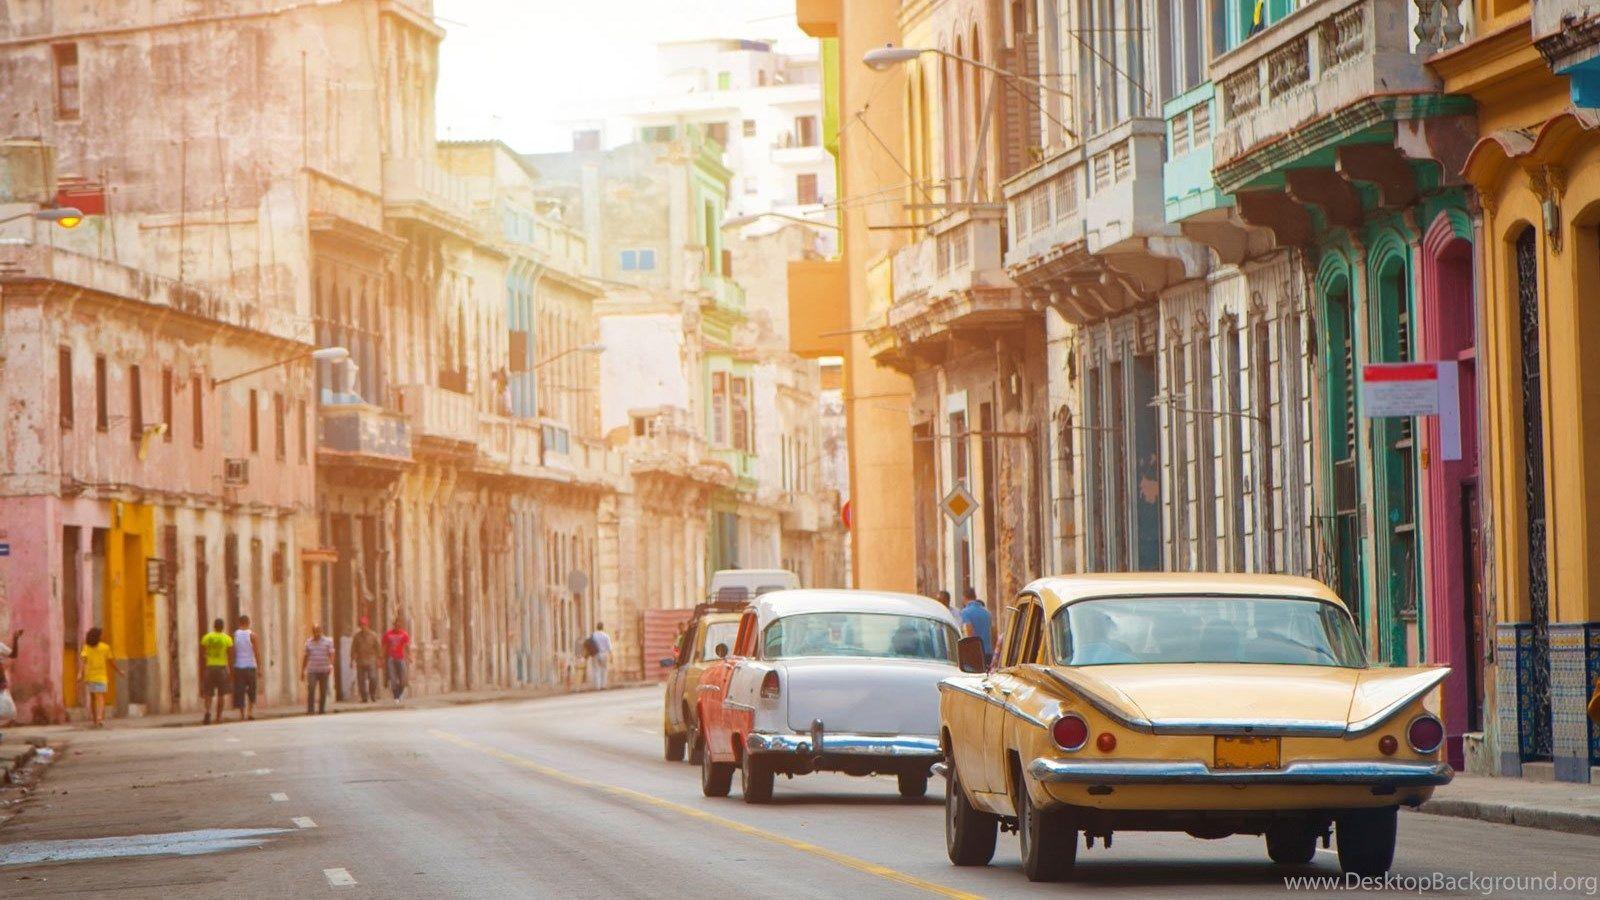 Cuba Wallpapers Top Free Cuba Backgrounds Wallpaperaccess